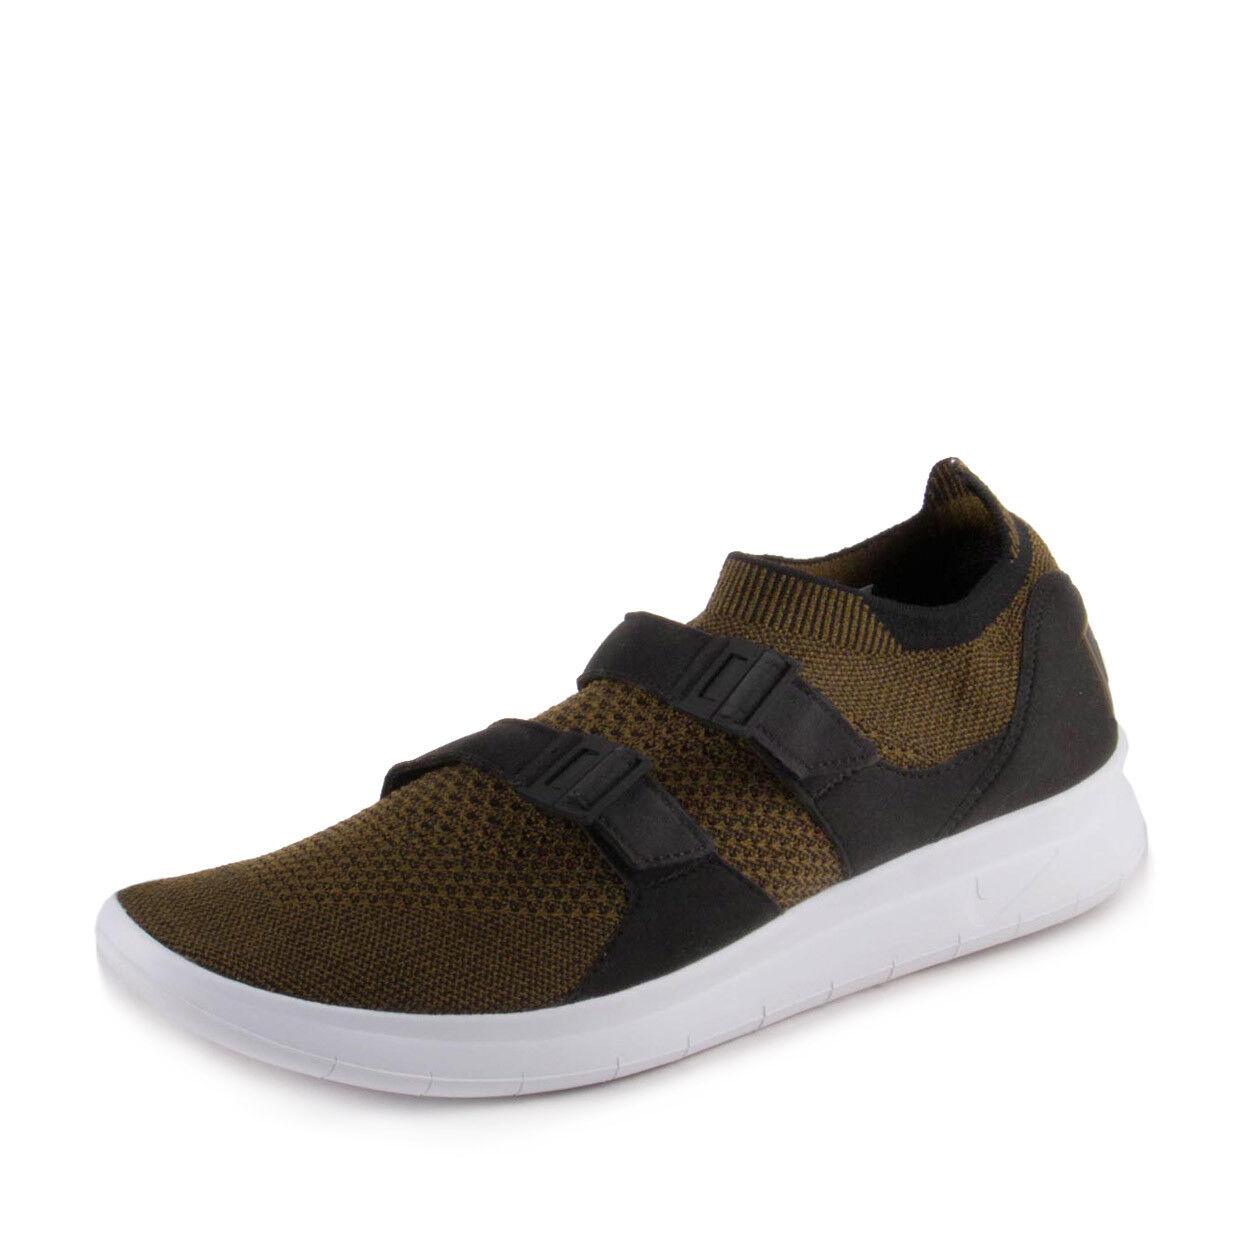 Nike Para Hombre Air sockracer sockracer sockracer Flyknit Negro/Oliva-Blanco 898022-002 2542d0